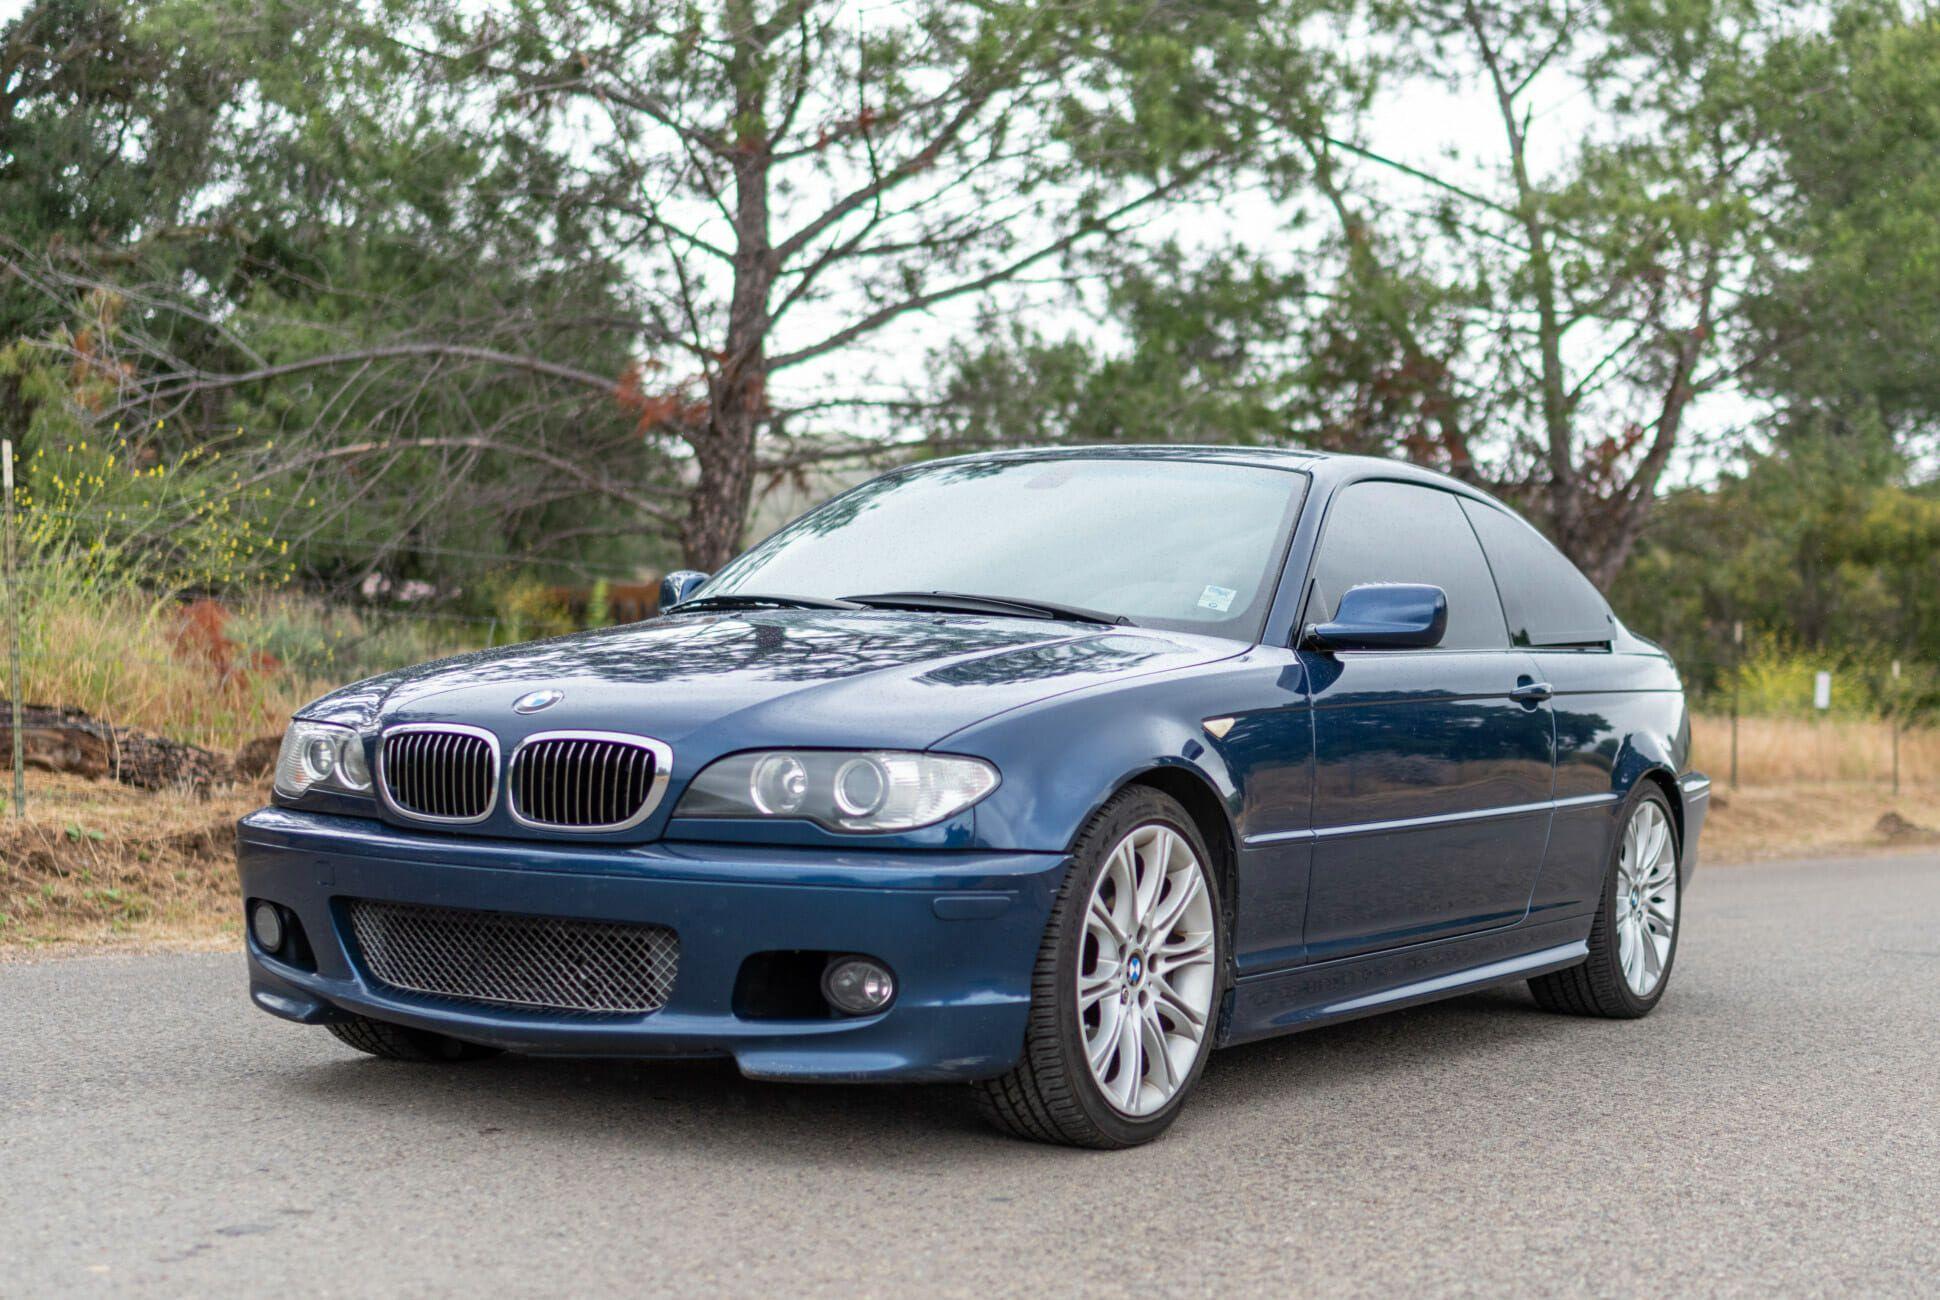 2004-BMW-330Ci-ZHP-6-Speed-gear-patrol-slide-05